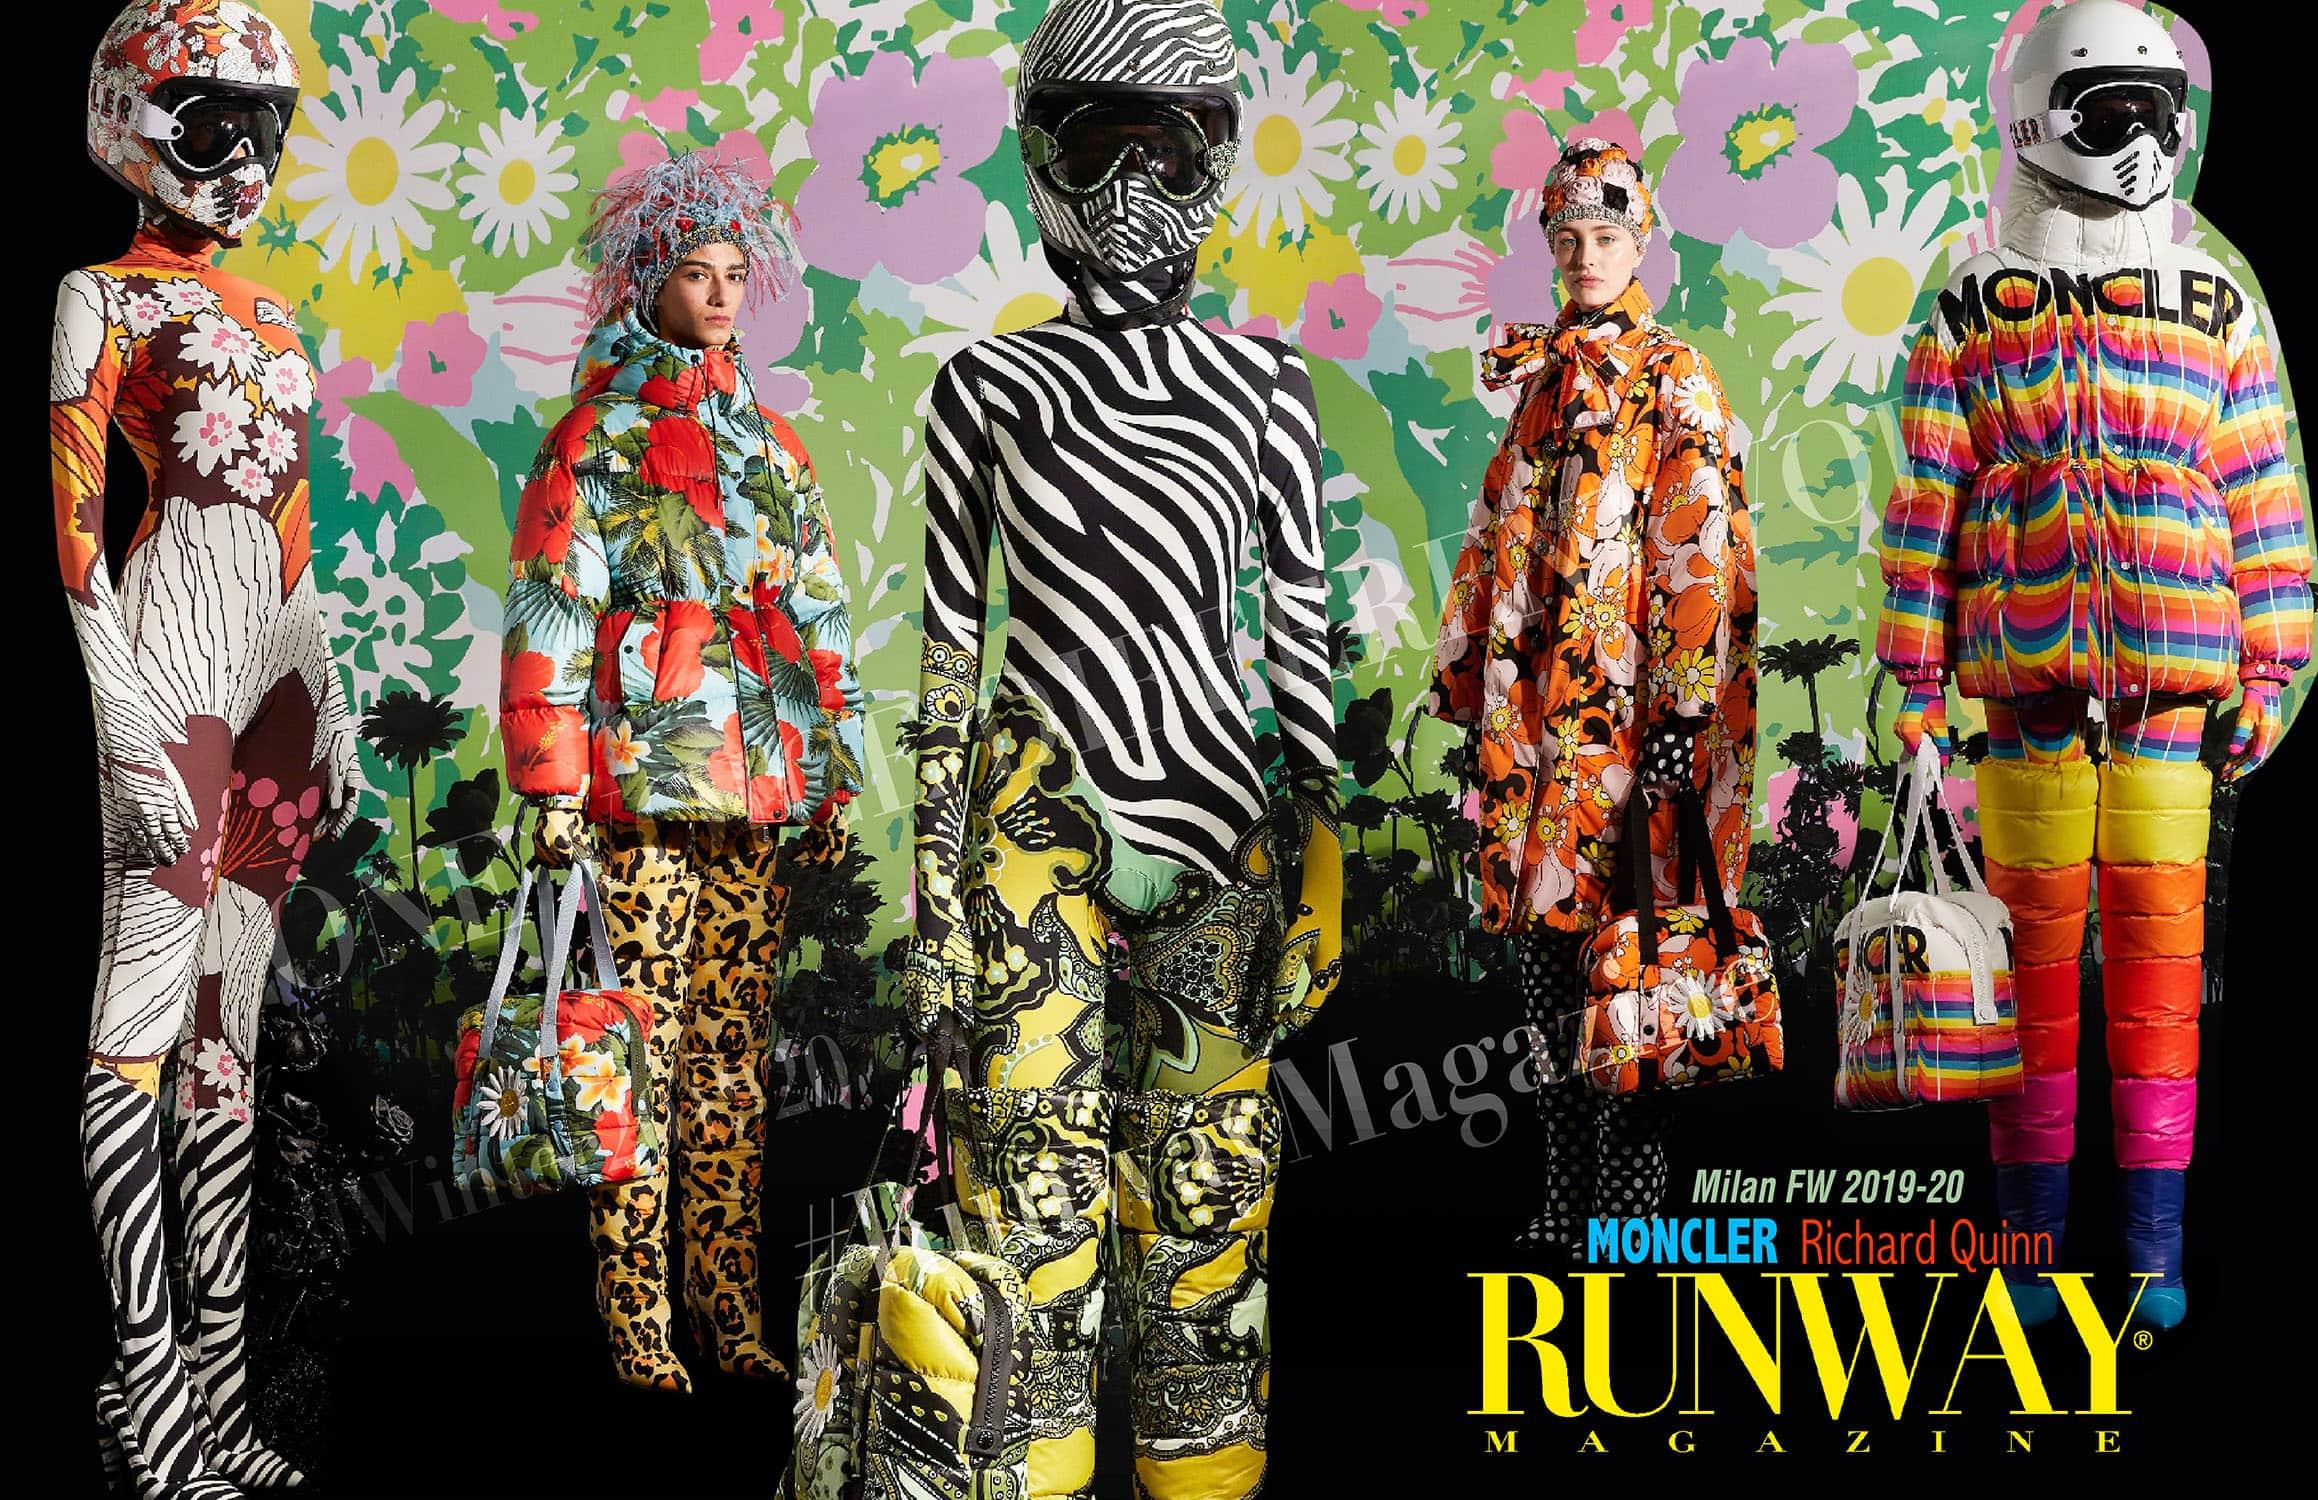 Moncler Genius Fall-Winter 2019-2020 Milan - Designer Richard Quinn by Runway Magazine